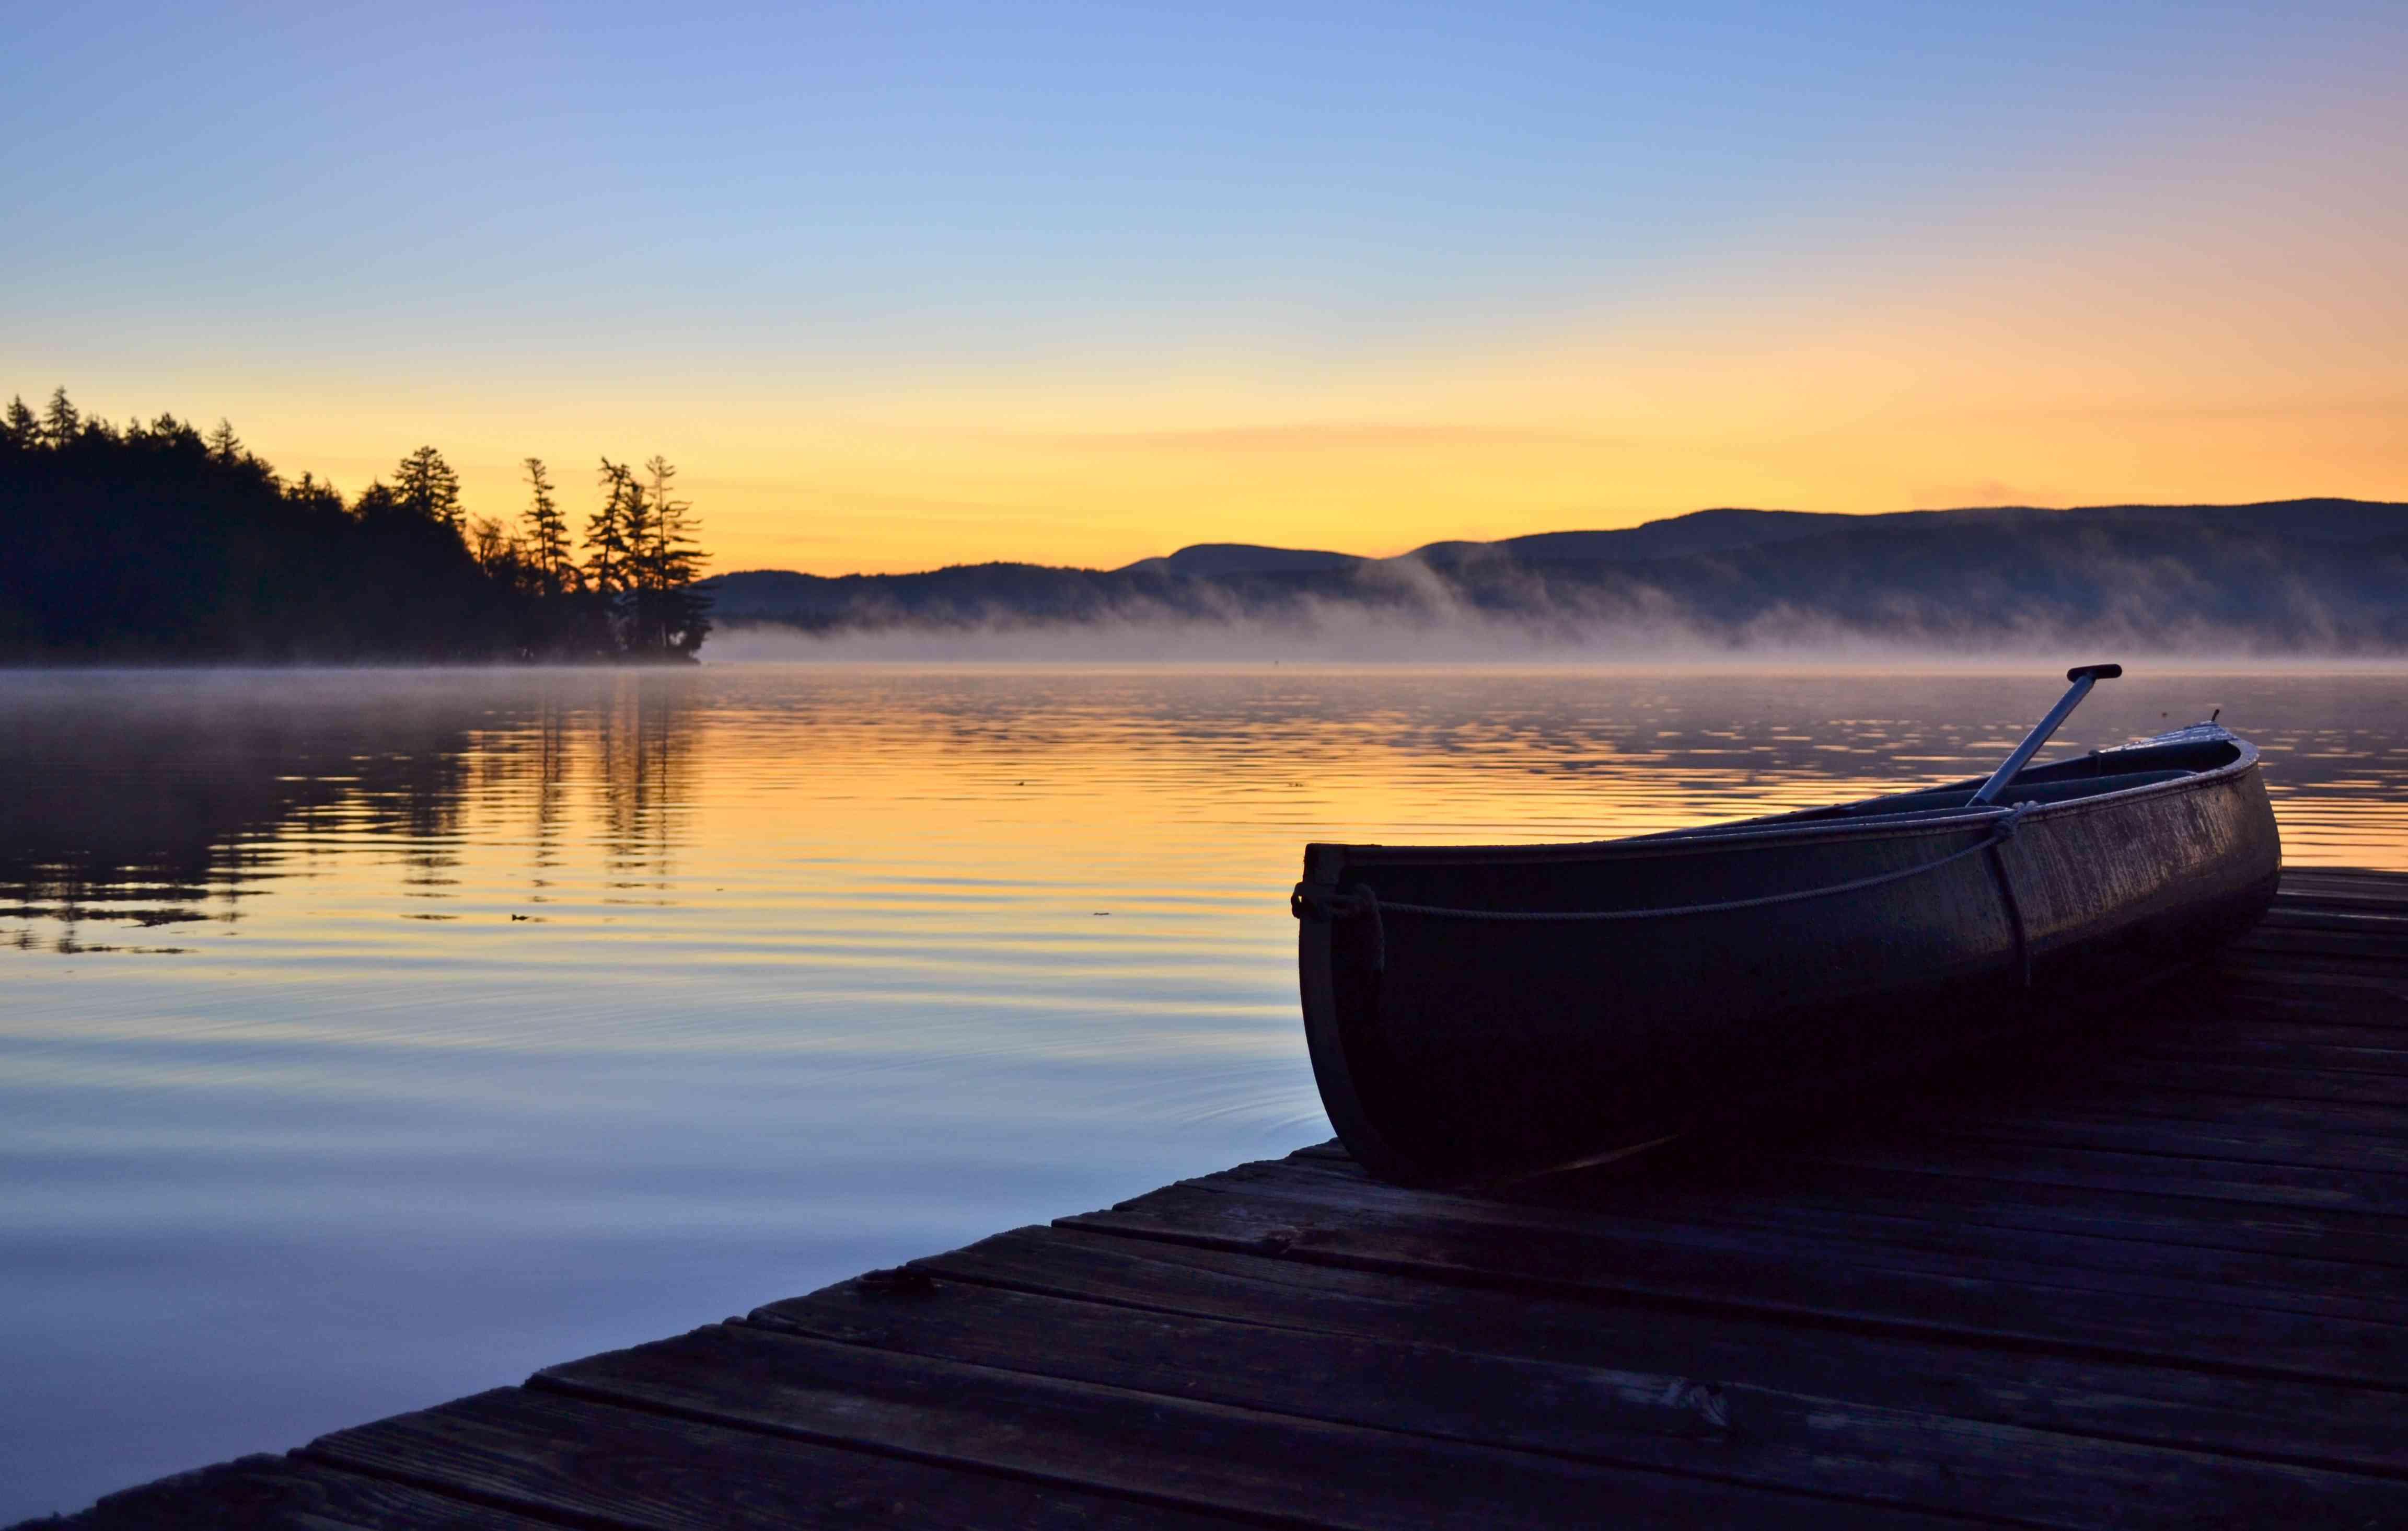 Canoe on jetty at Raquette Lake, Adirondack Mountains, New York State, USA